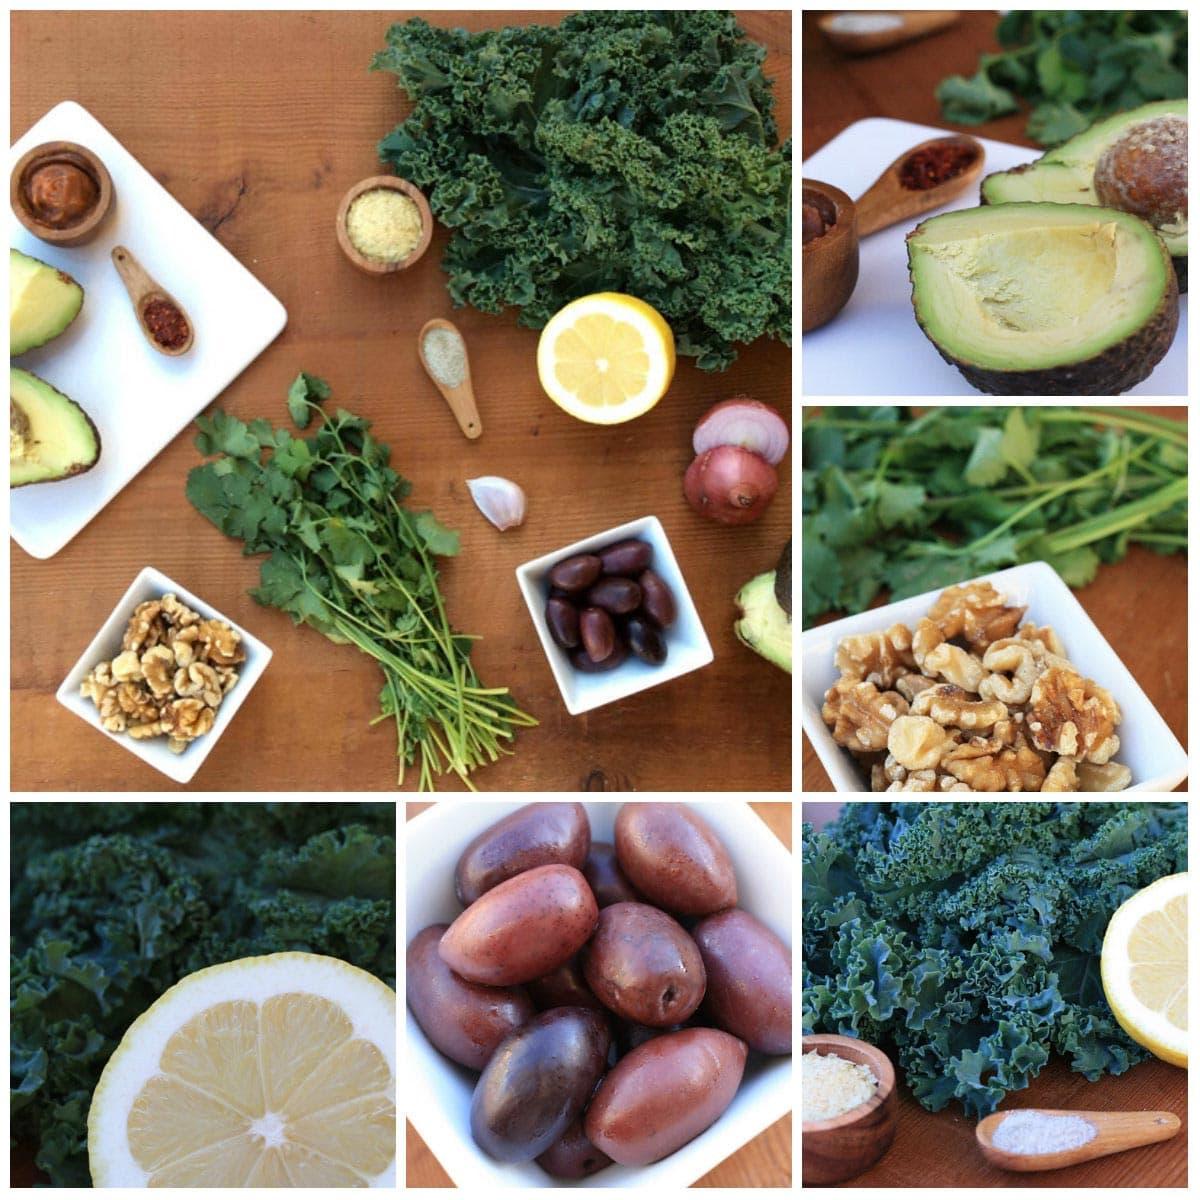 Ingredients d'amanida de kale